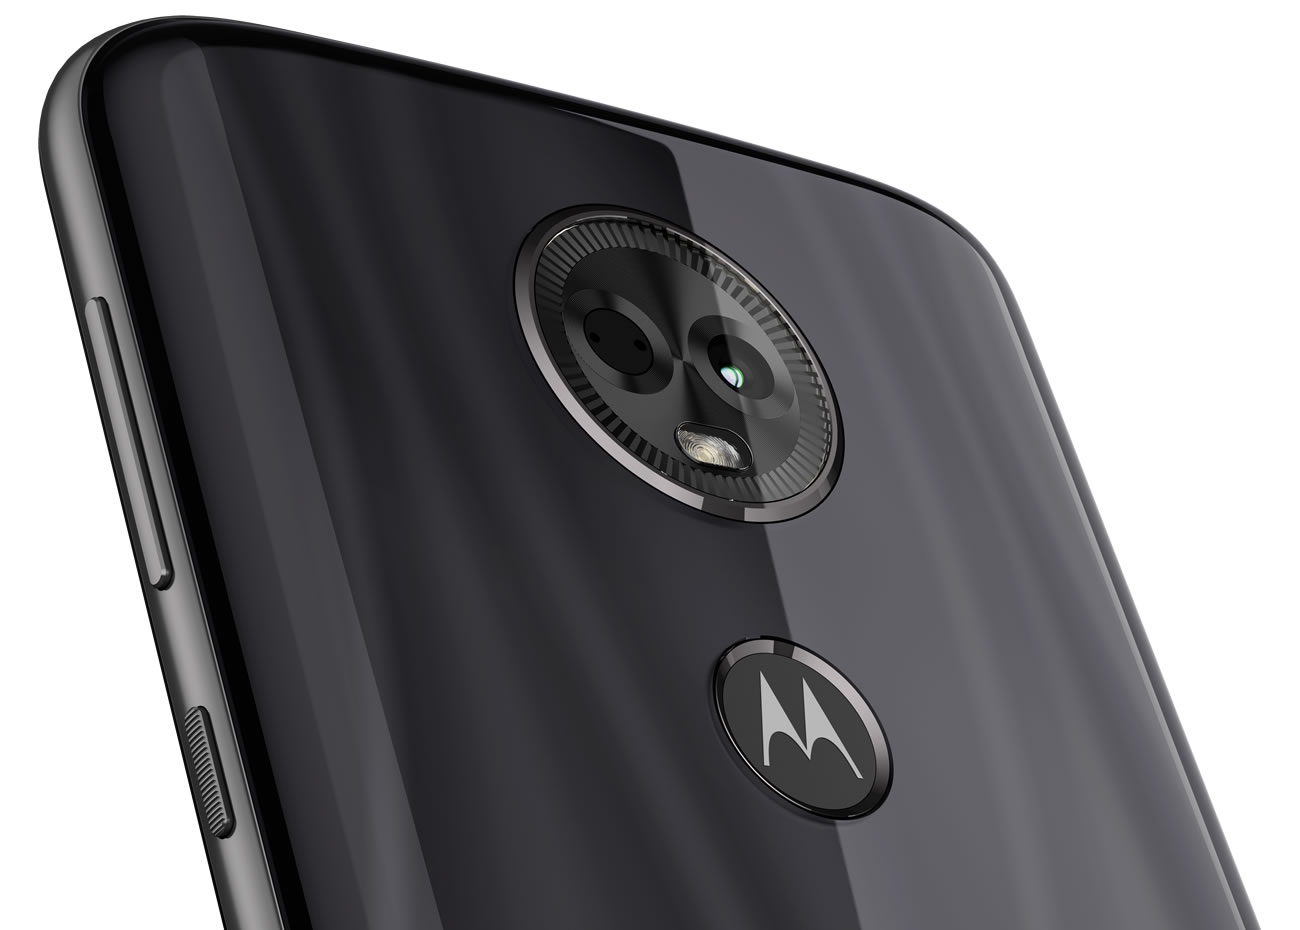 Comienza la venta del Moto E5 y Moto E5 Plus en Chile